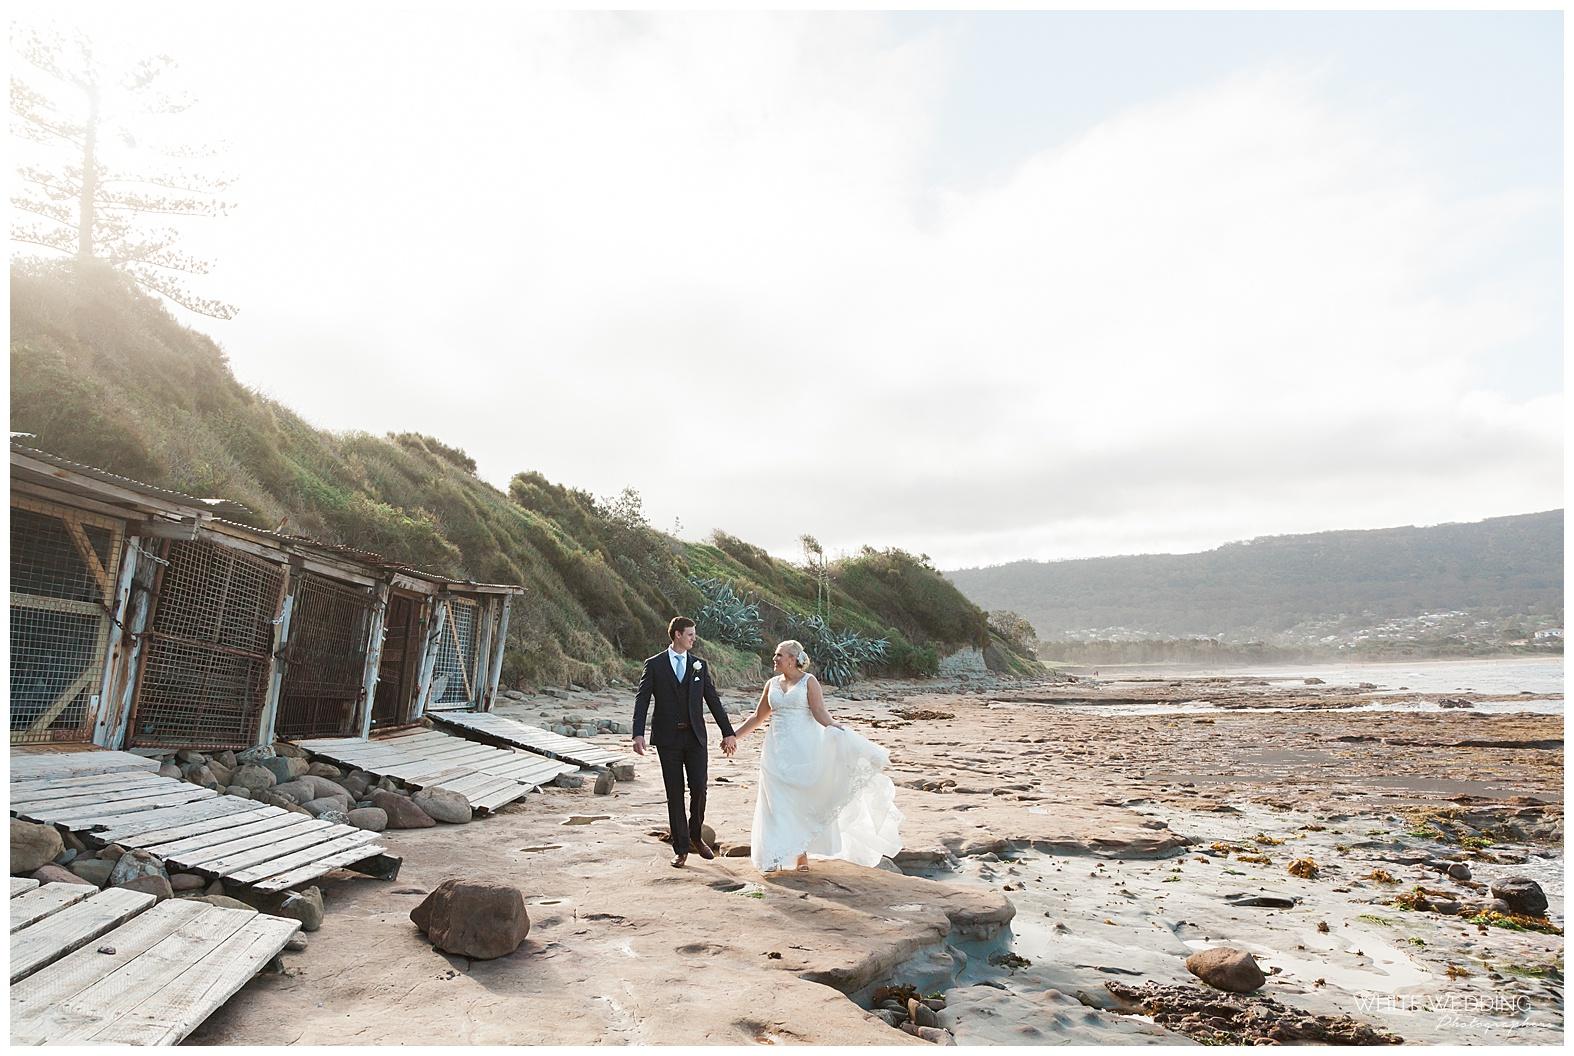 City Beach Wollongong Wedding Photographer Melissa And Ryan Wedding